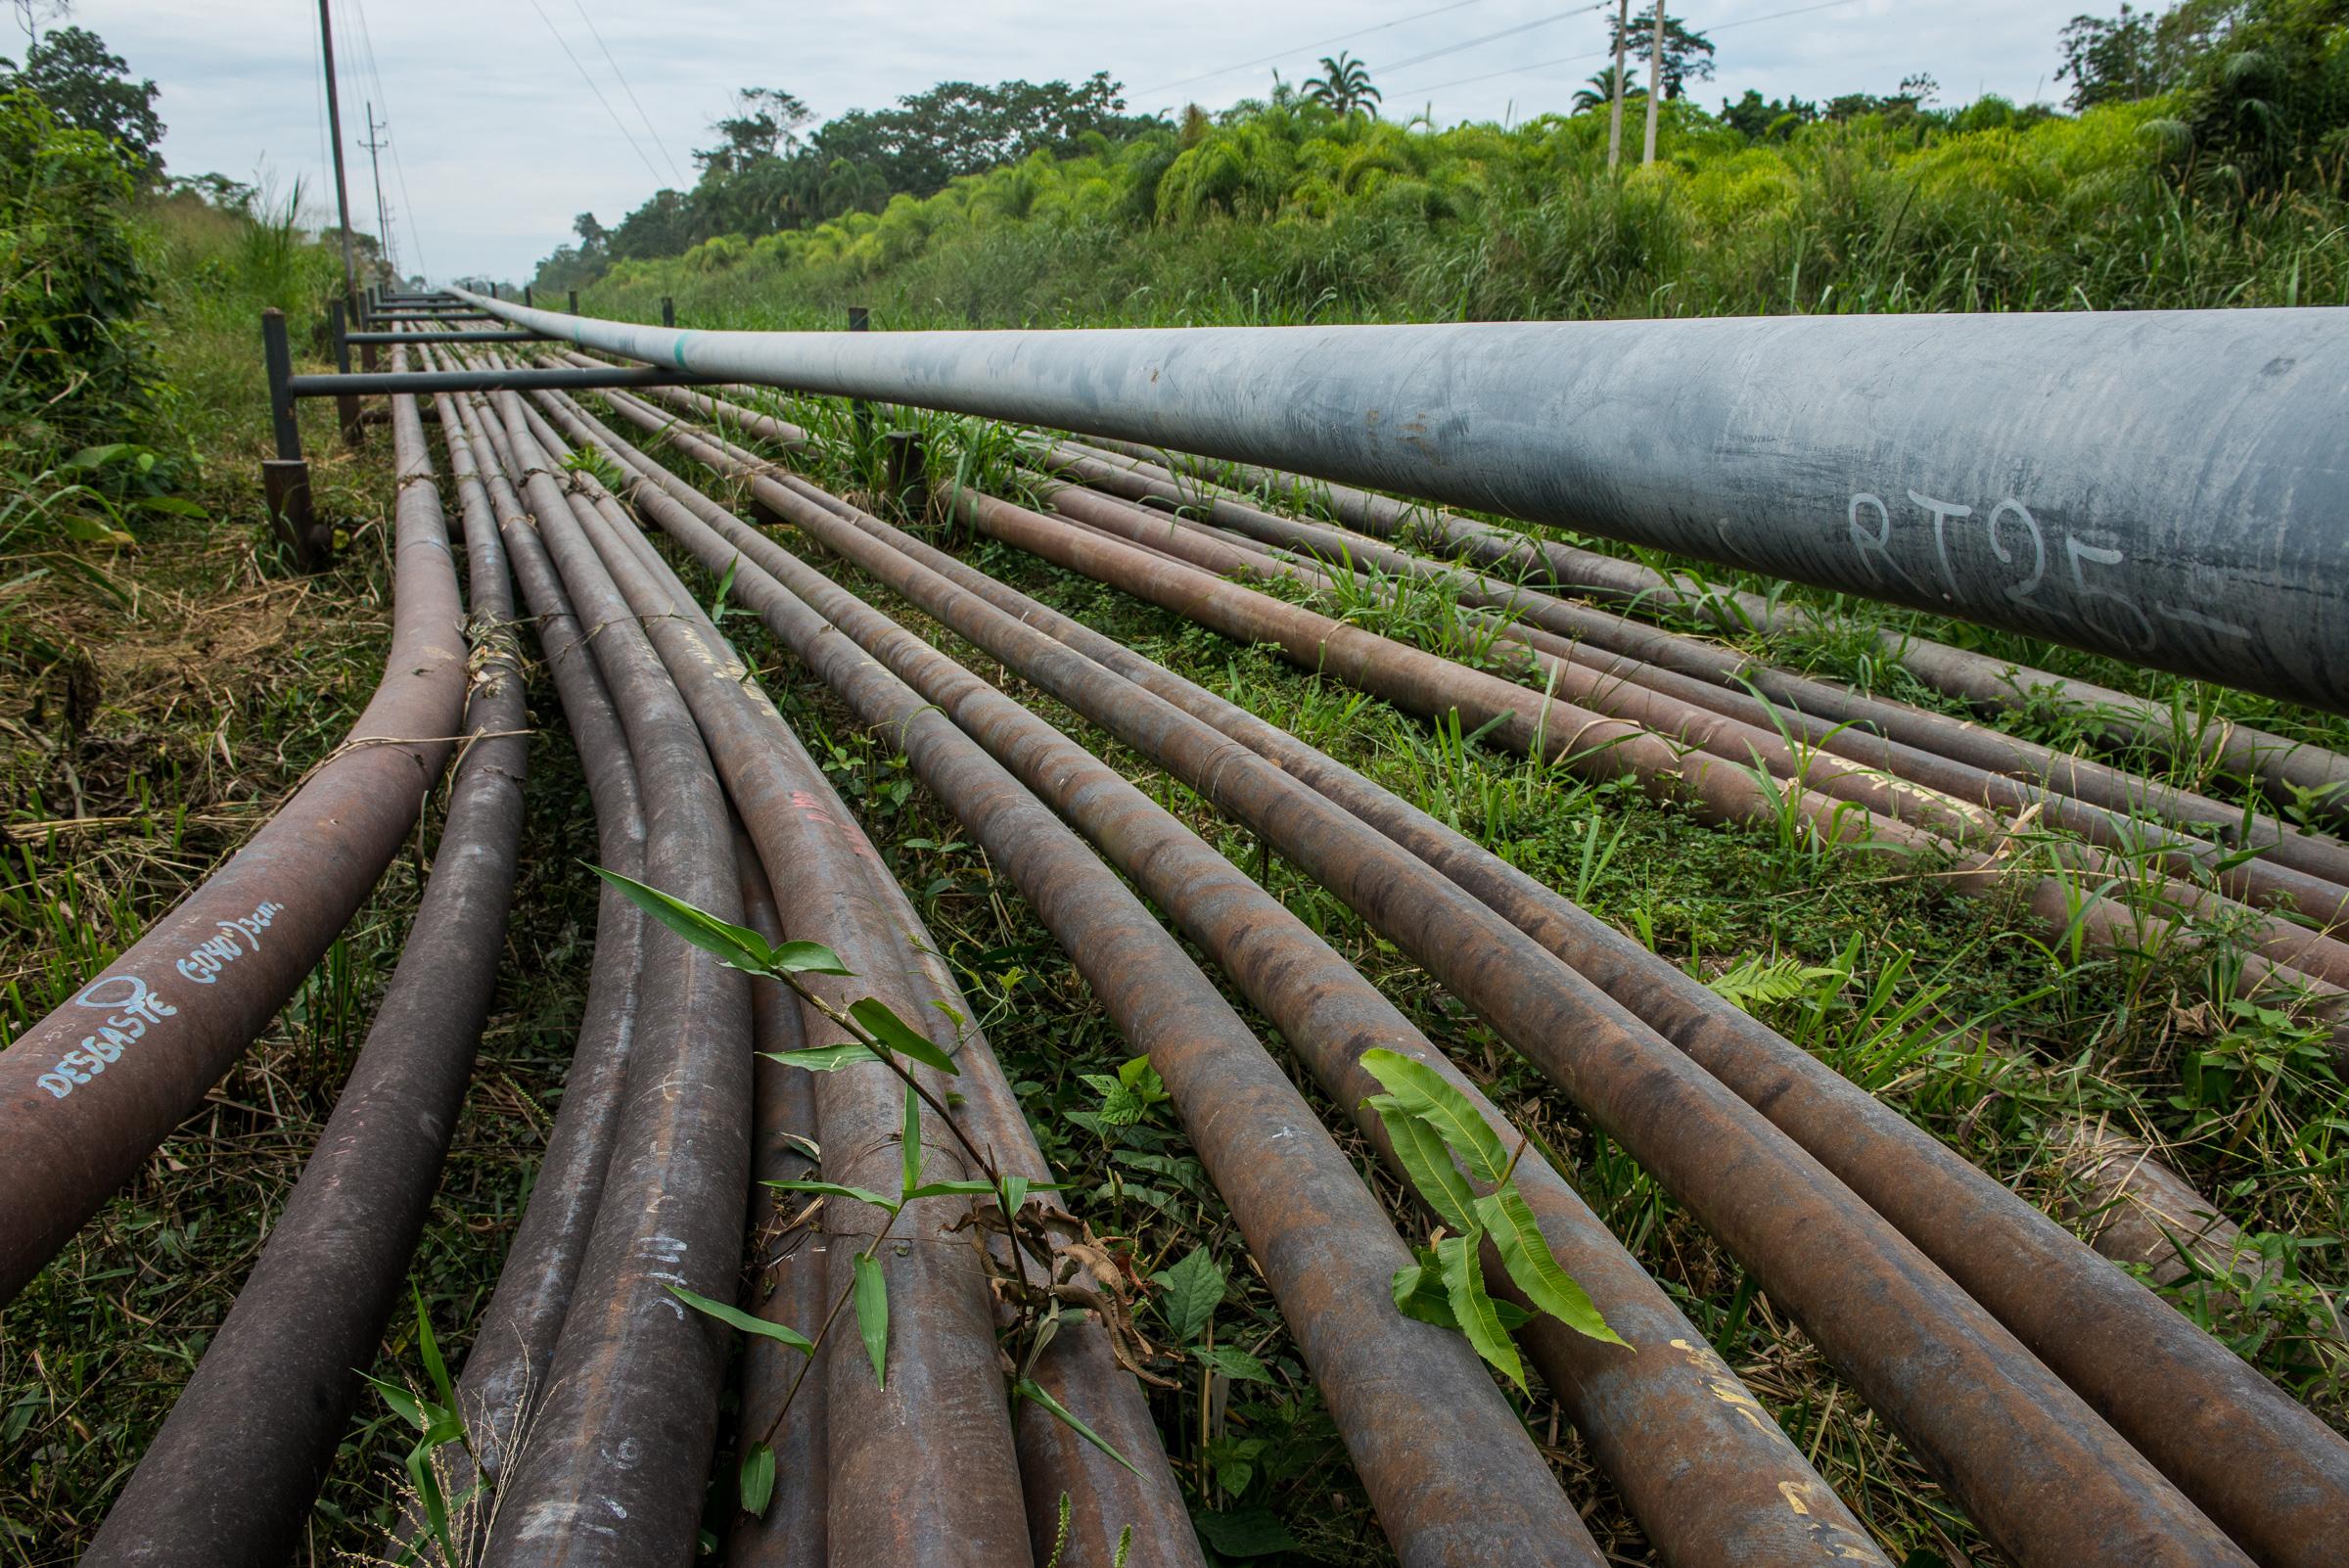 Pipelines originating from a Rio Napo oil company installation near Sacha Norte Uno en route from Coca to Pompeya, north of Yasuni National Park. Neil Ever Osborne